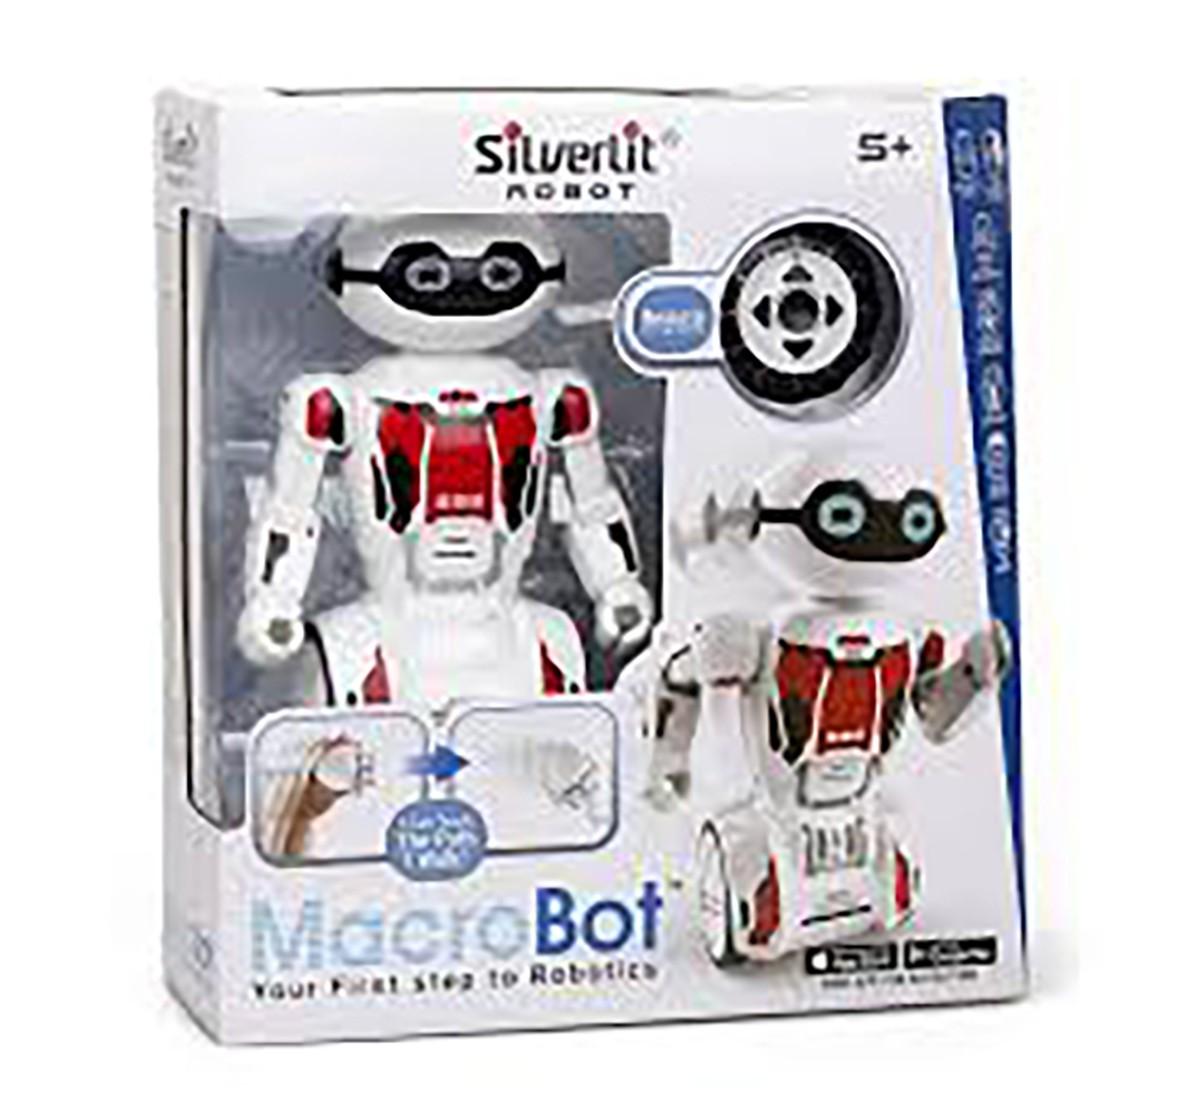 Silverlit Maze Breaker In 3 Color Assorted Robotics for Kids age 5Y+